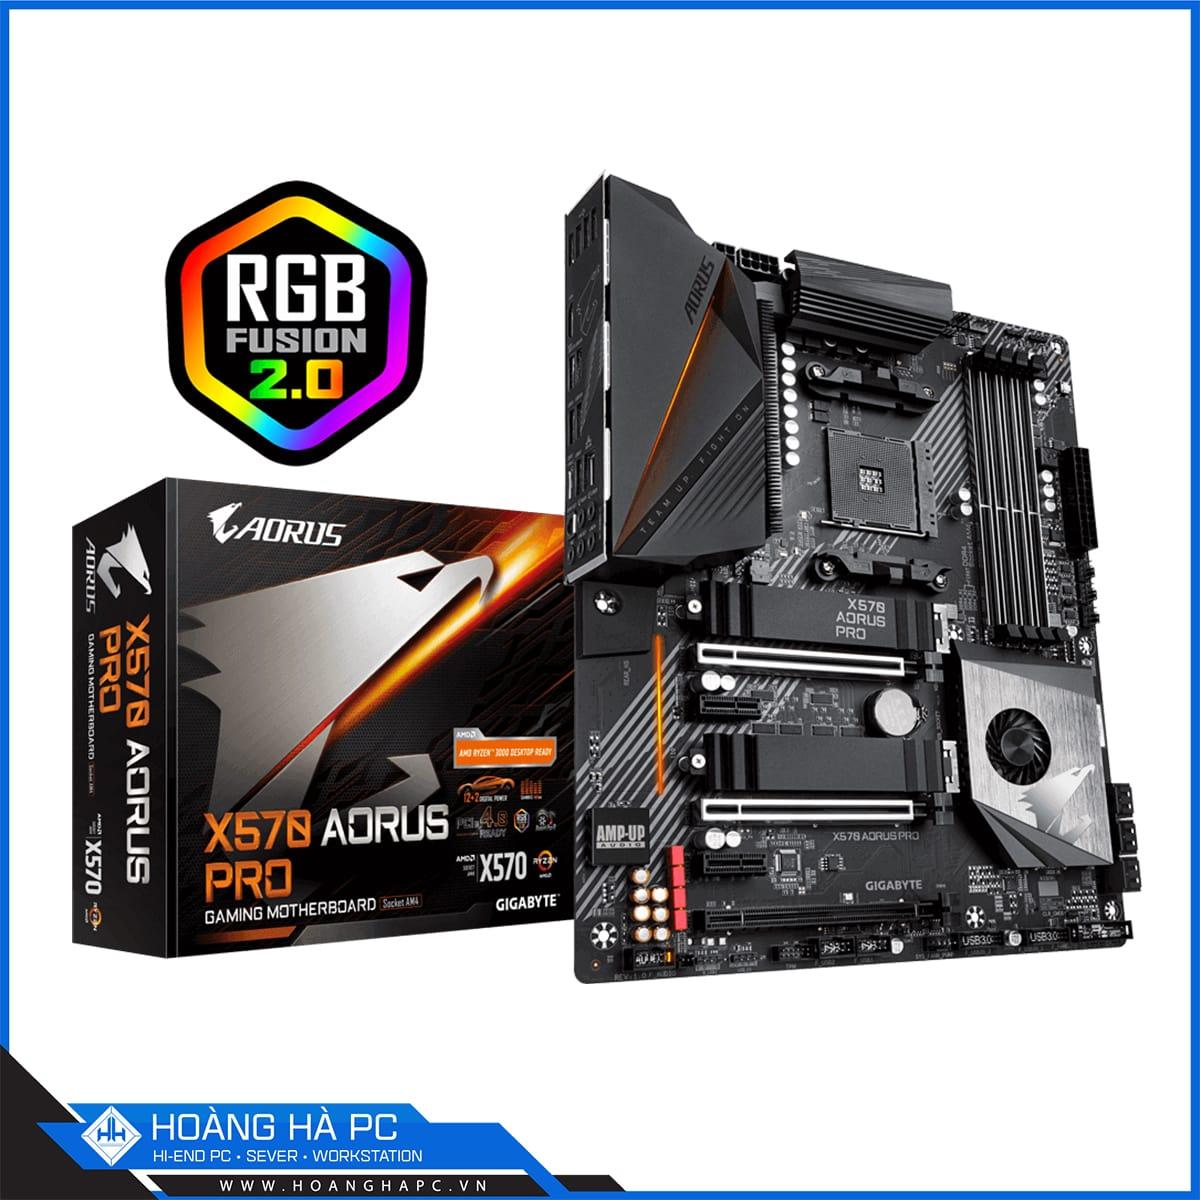 Mainboard GIGABYTE X570 AORUS PRO